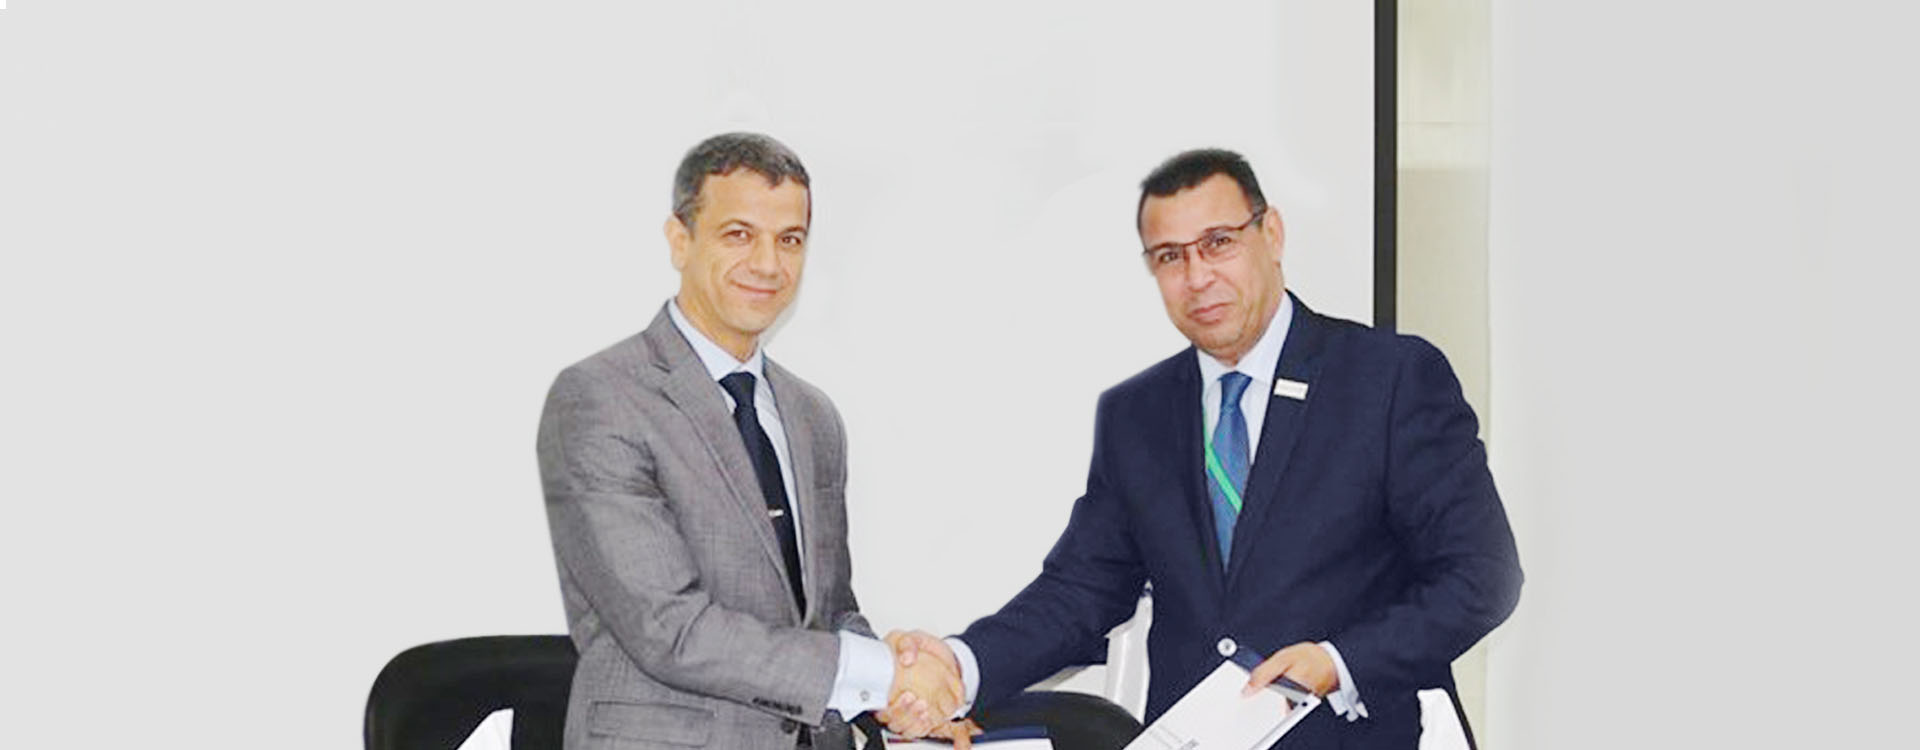 Jumhouria Bank signed an MOU with CIBAFI